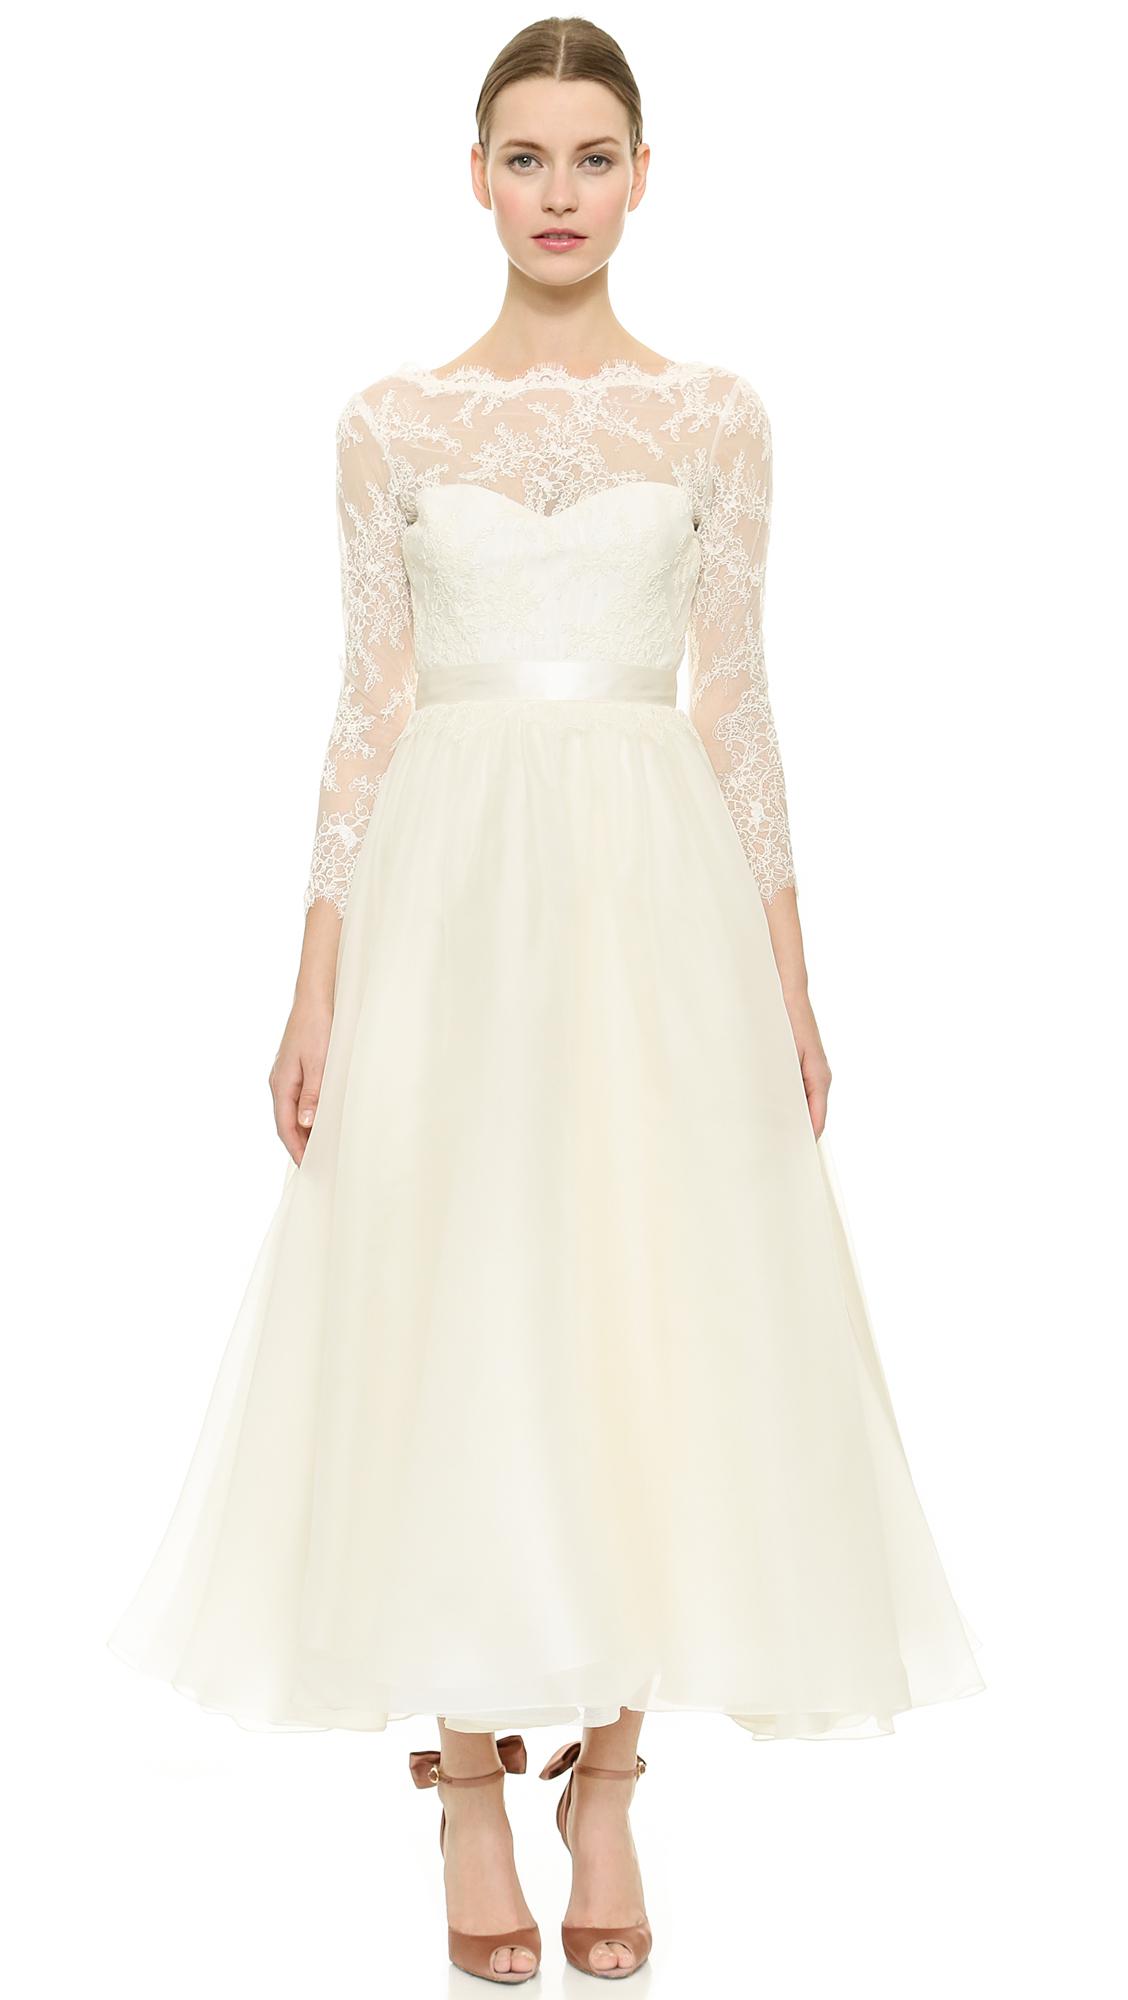 Marchesa Lace Up Back Dress Ivory in White Ivory